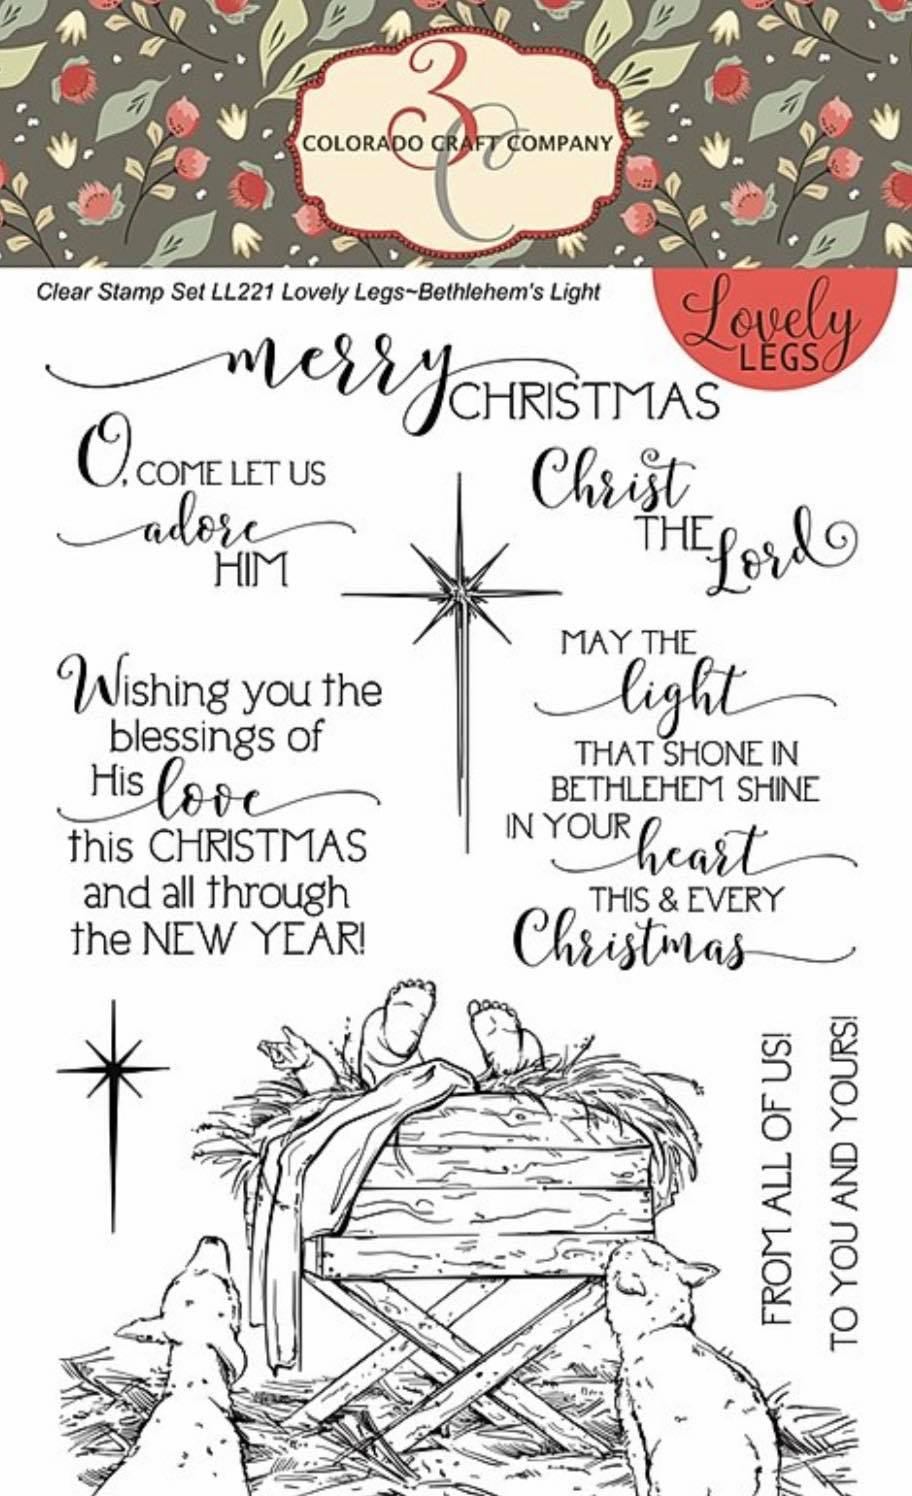 Colorado Craft Co. - Lovely Legs: Bethlehem's Light Stamp Set